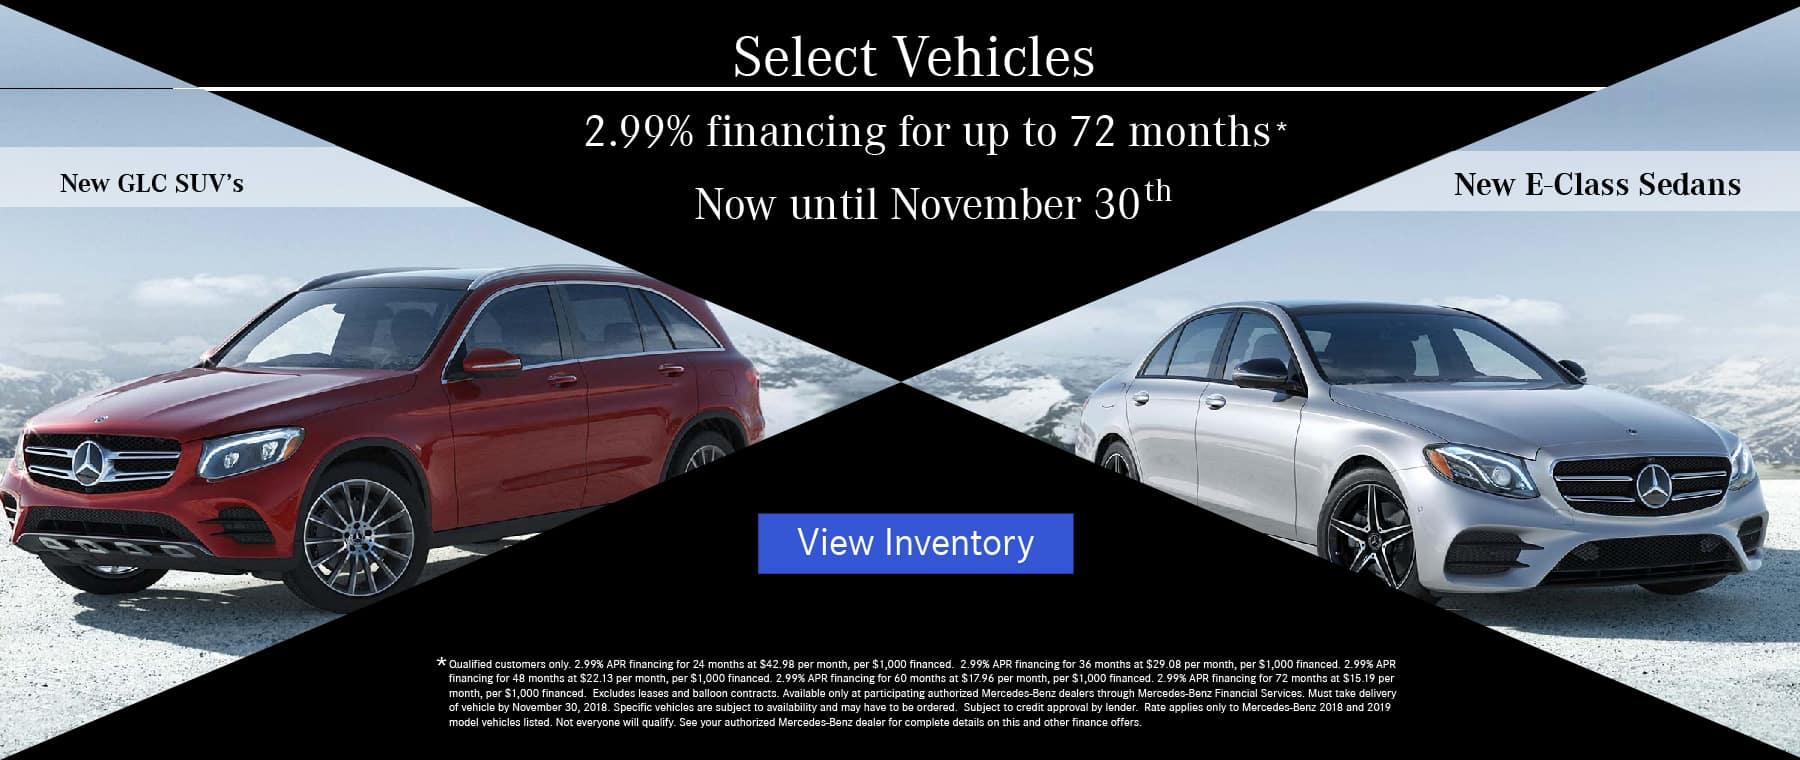 Mercedes Benz Of Westminster Sprinter Center Denver Co Area Dealer 08 Fuel Filter Location Search Anything